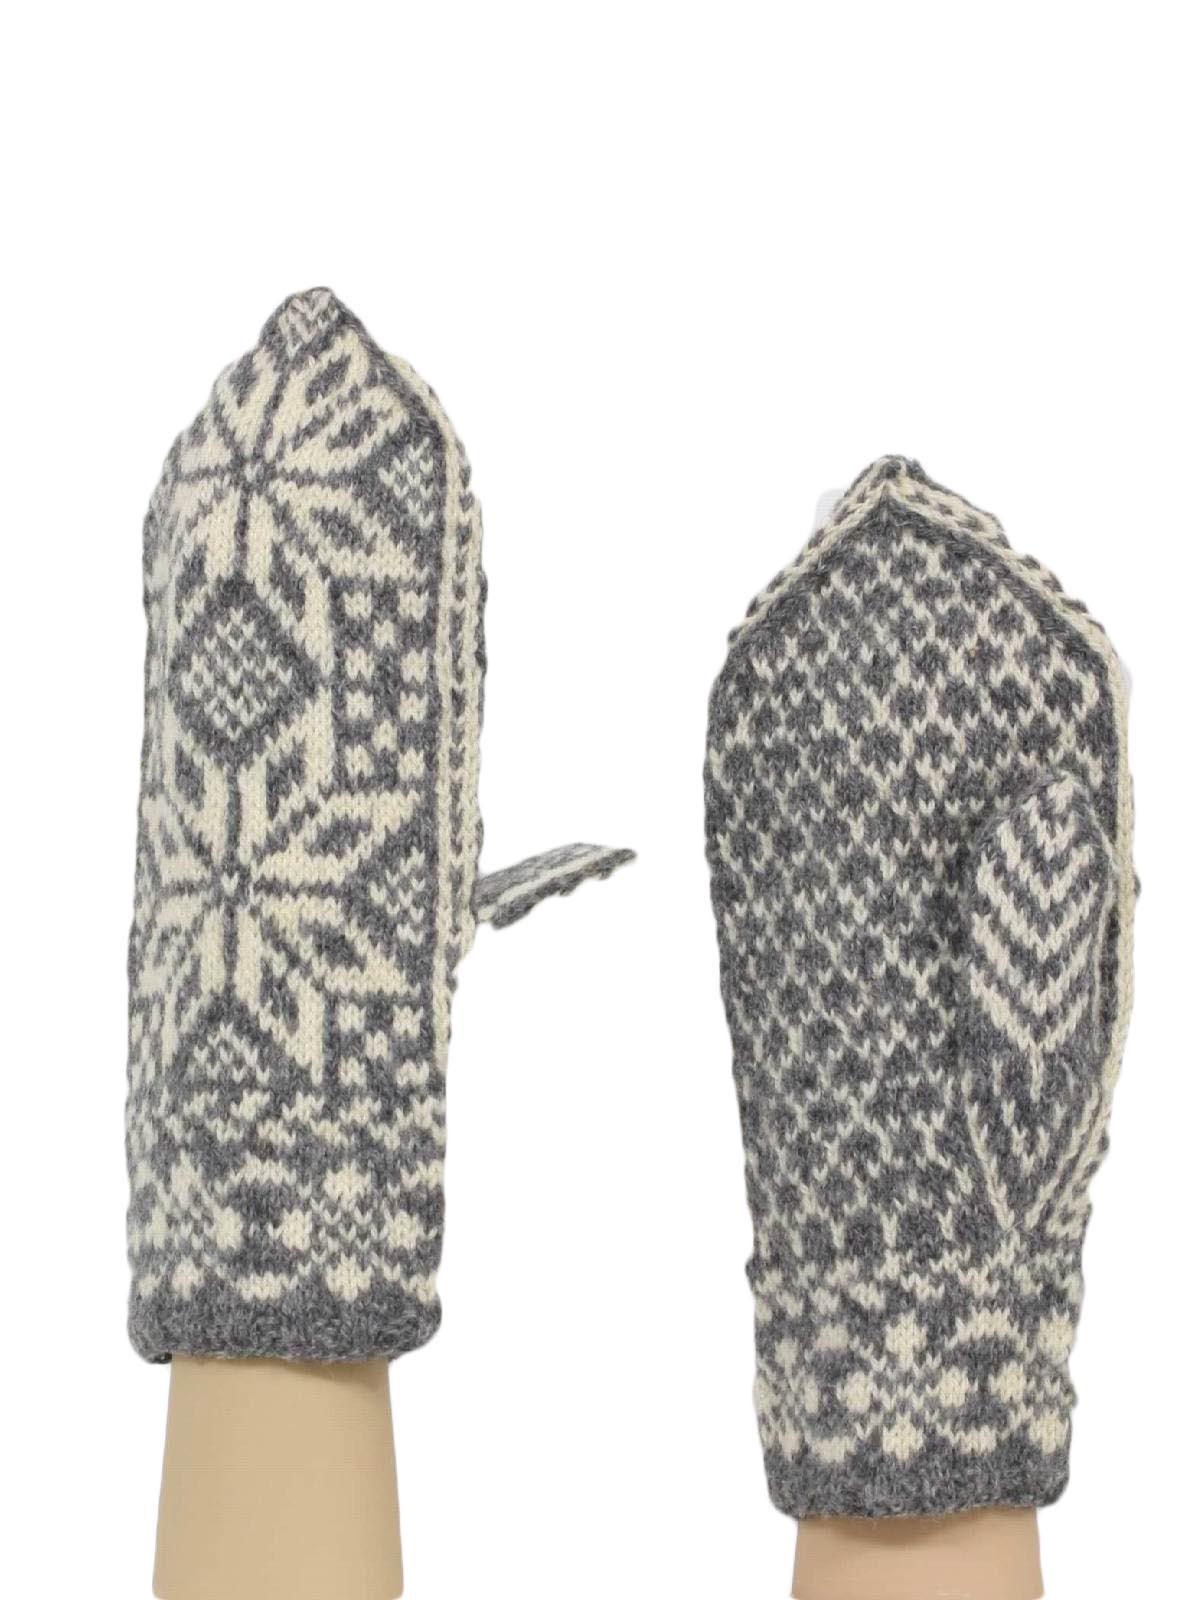 Vintage 40 S Gloves 40s No Label Mens Gray White